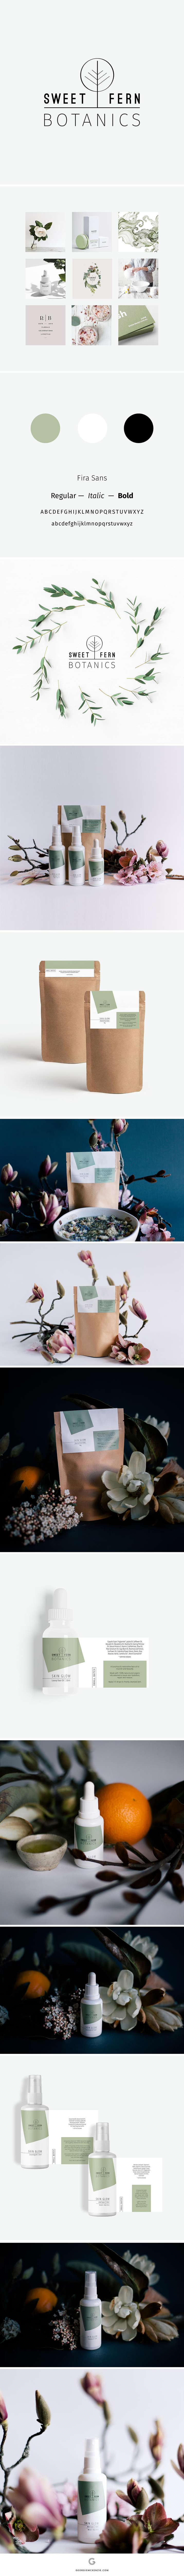 Georgie McKenzie Graphic Design Portfolio Sweet Fern Botanics Packaging Branding